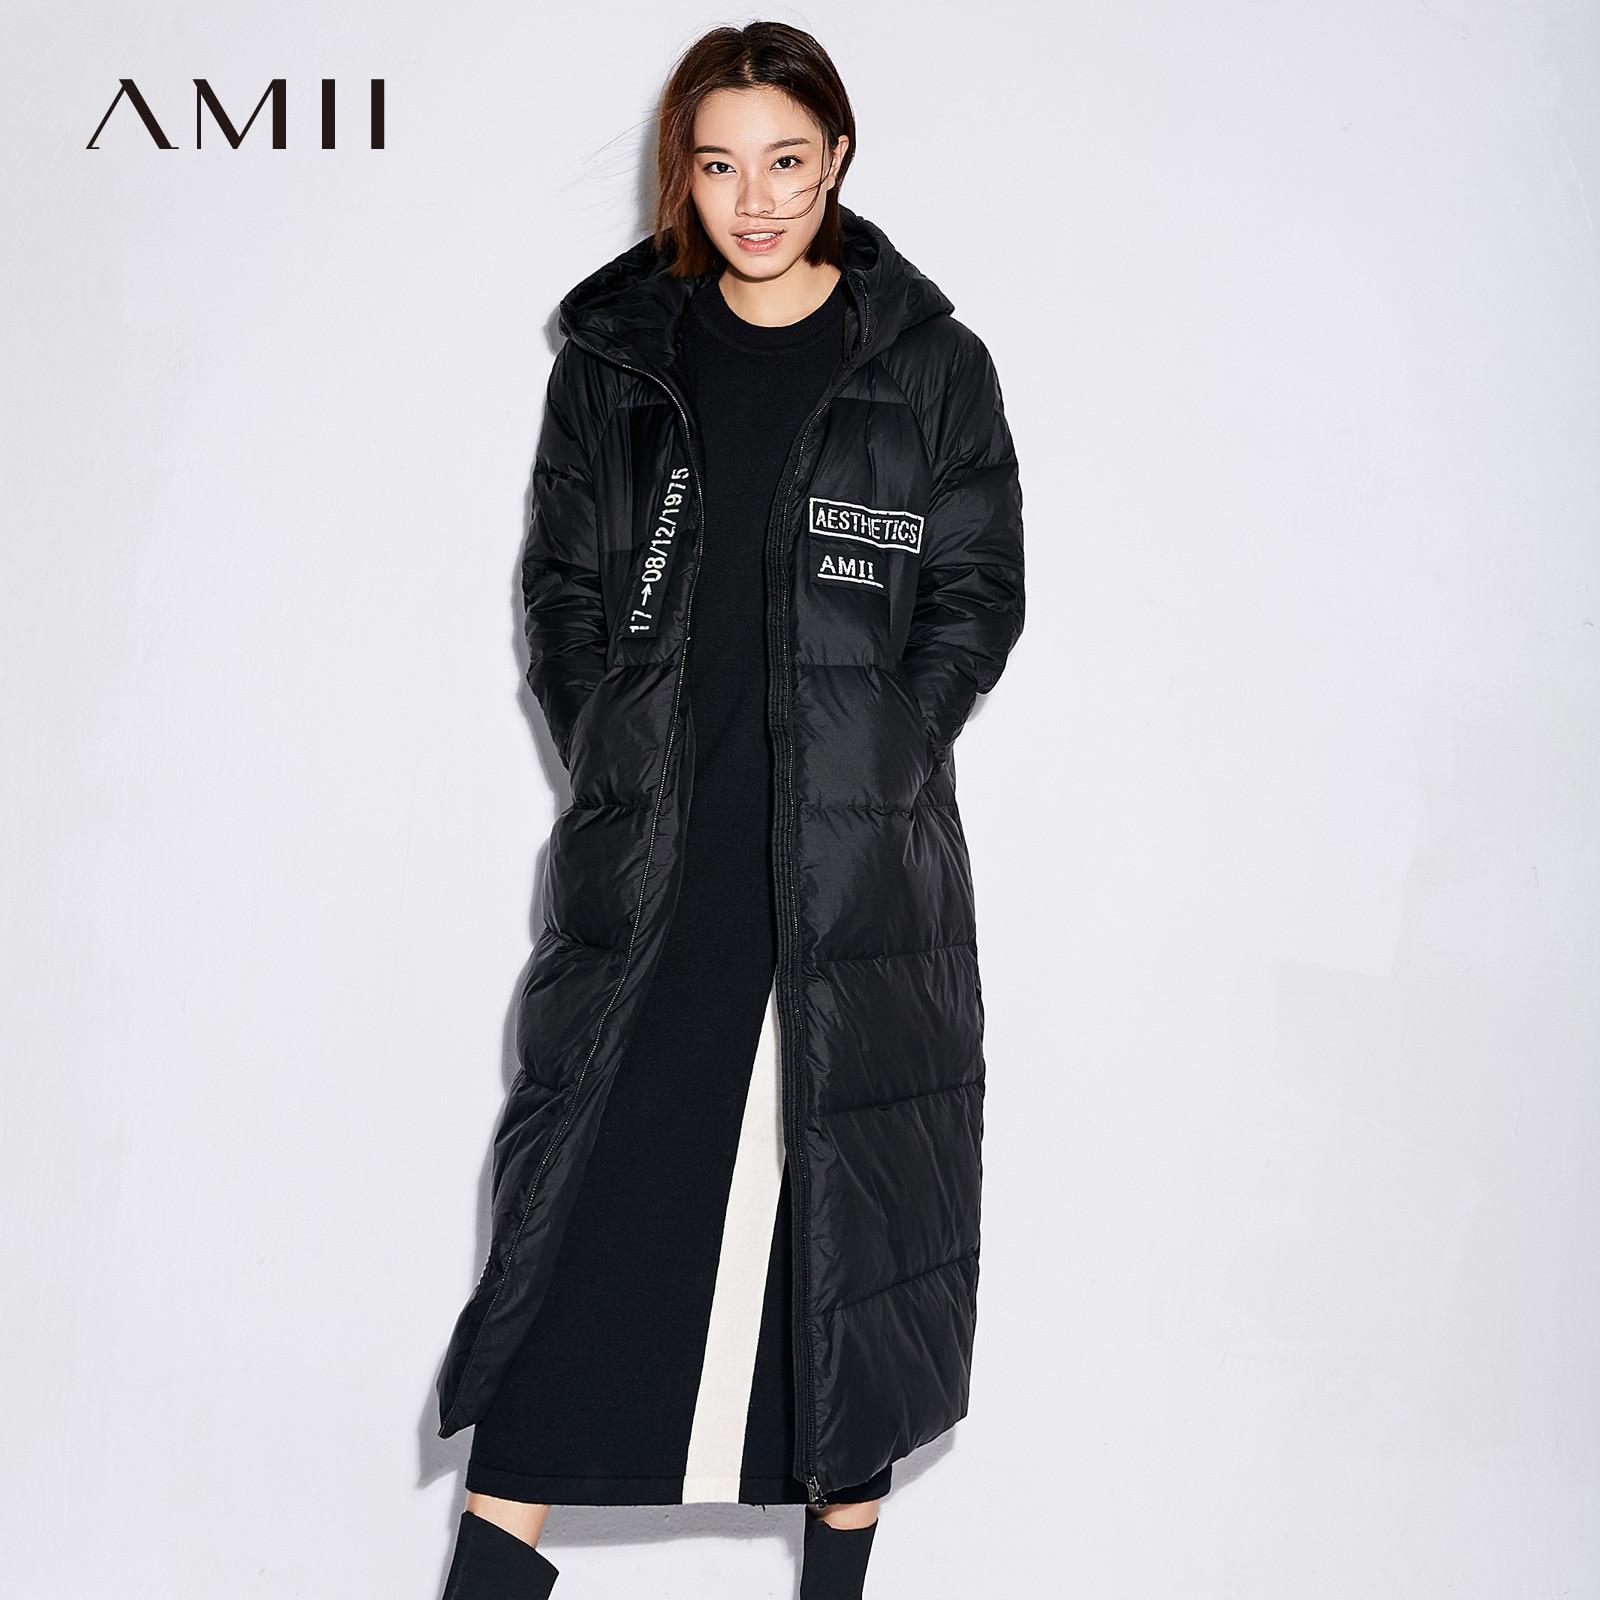 Amii Minimalist Women 2018 Winter Loose 90% White Duck Down Coat Hoodies Female Fashion Light Coats